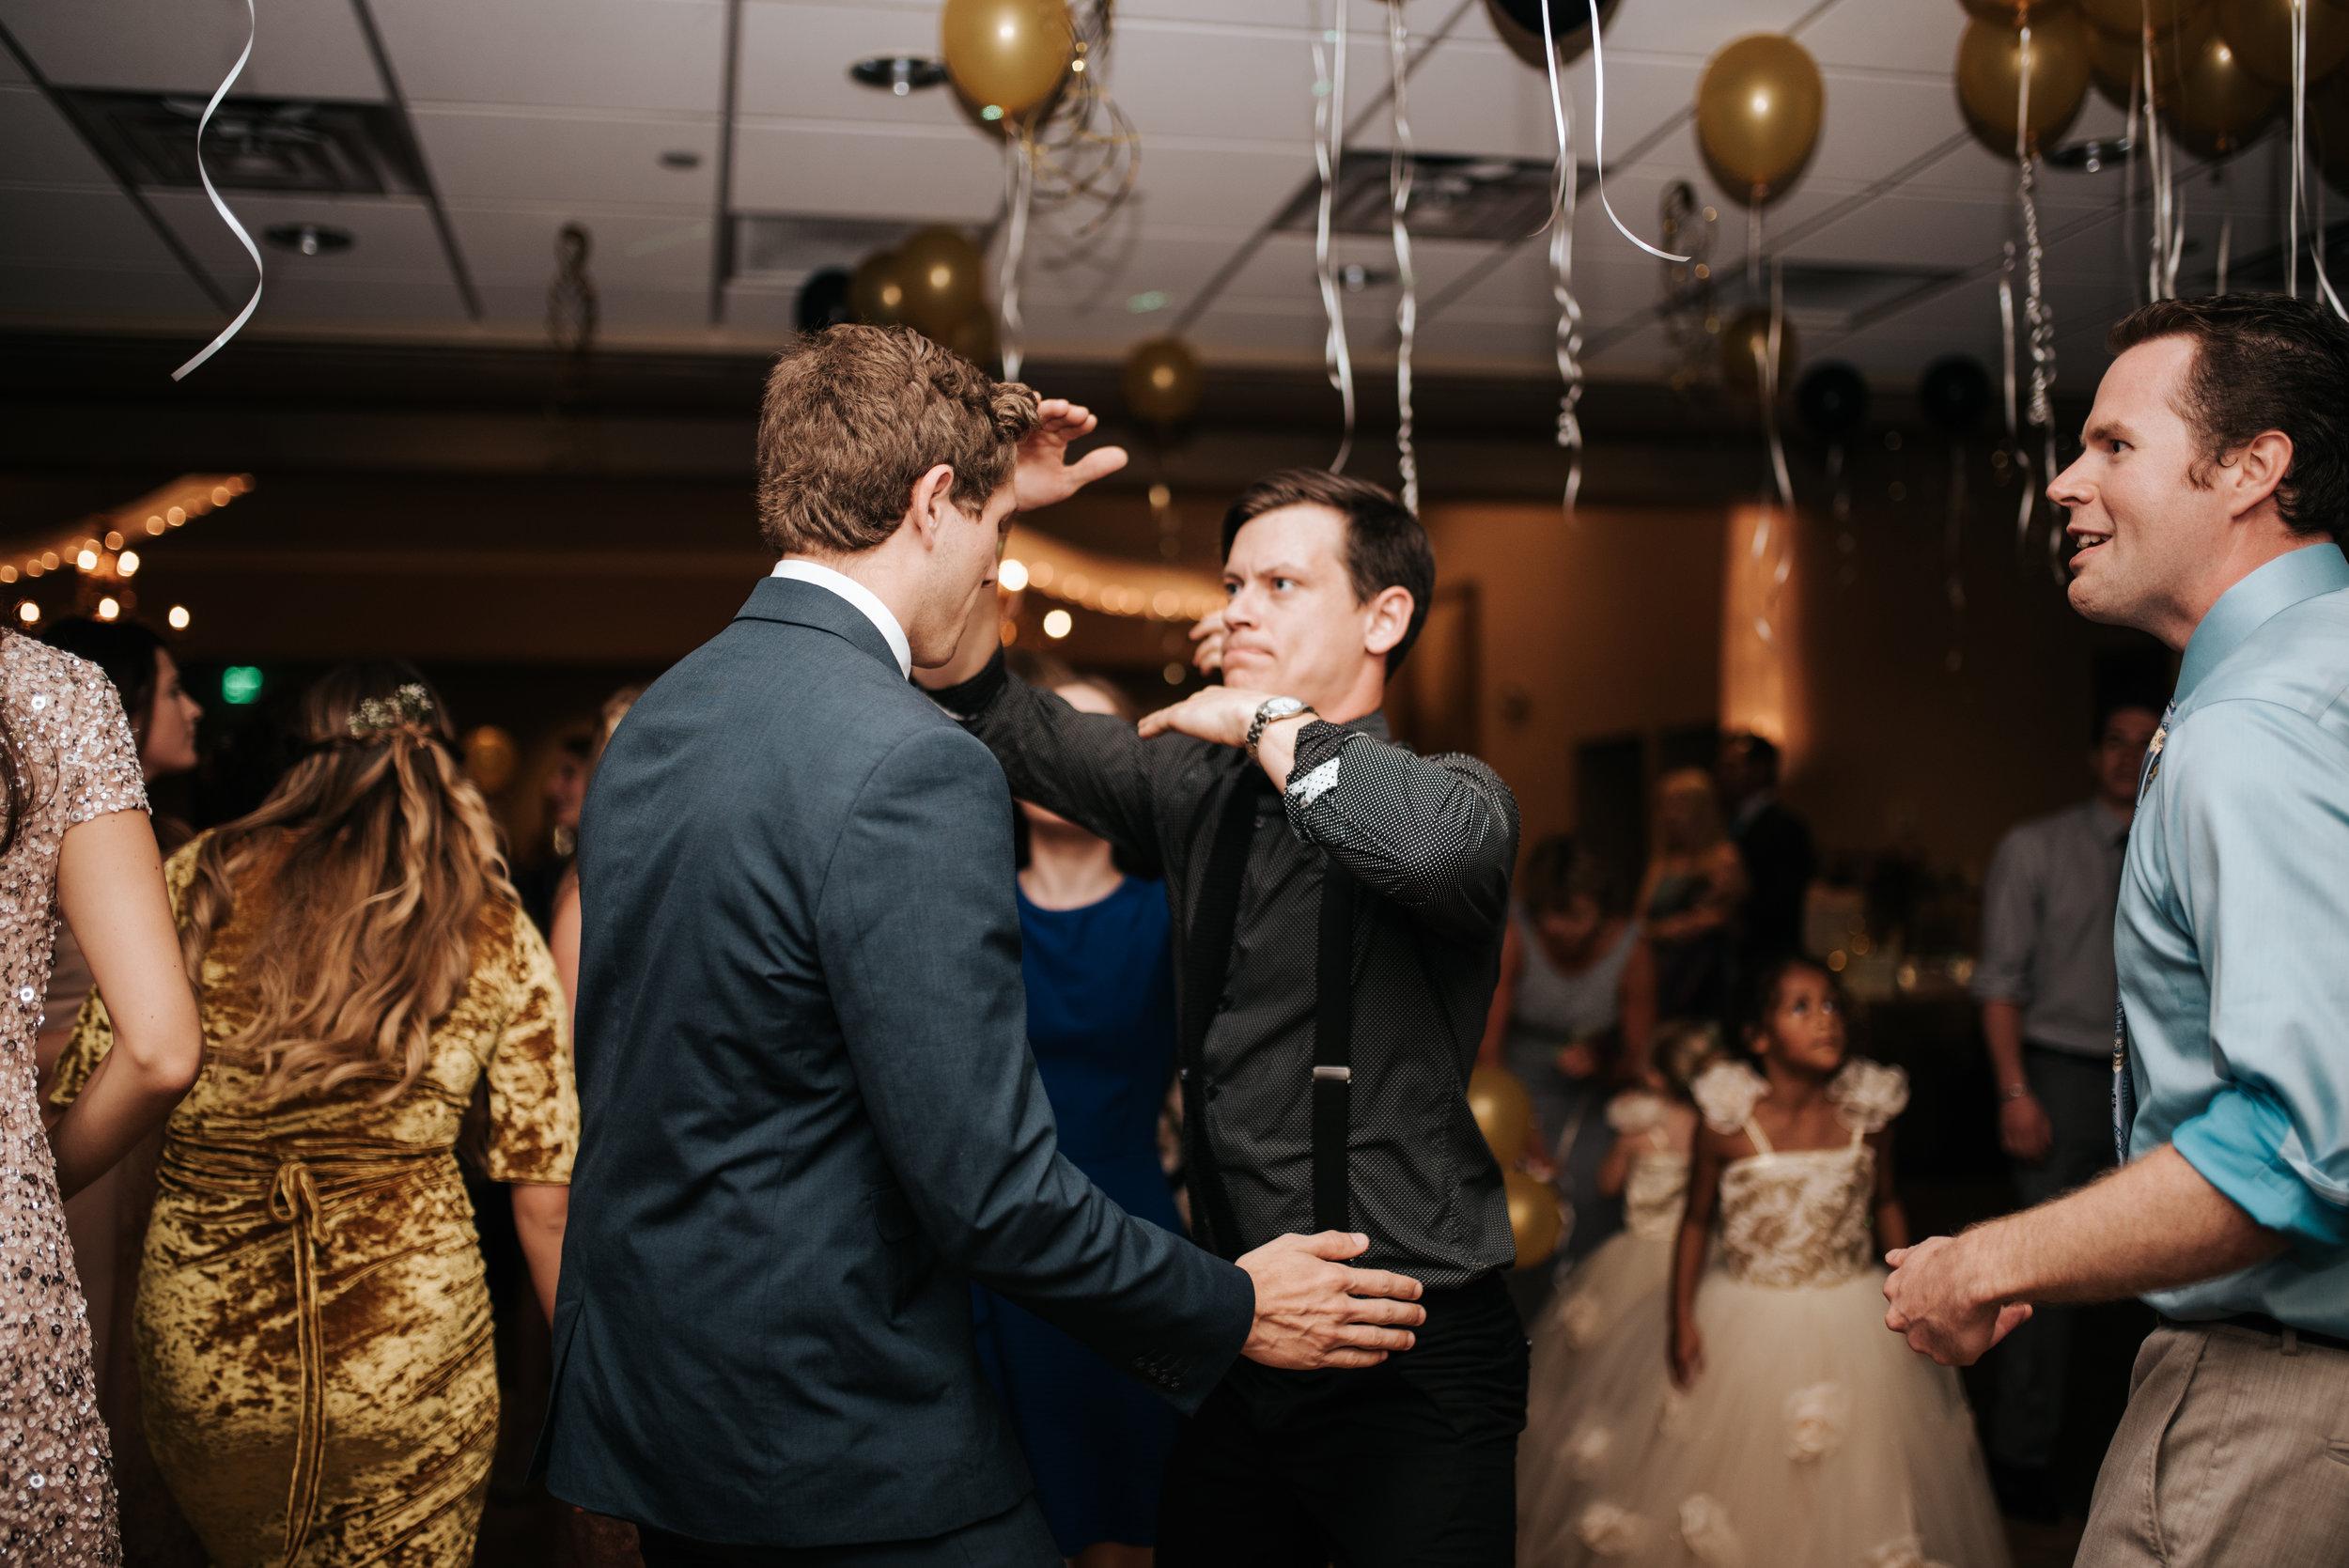 zayda-collin-panama-city-wedding-photography-trippy-bohemian-lisa-frank-wedding-dancing-party-48.jpg